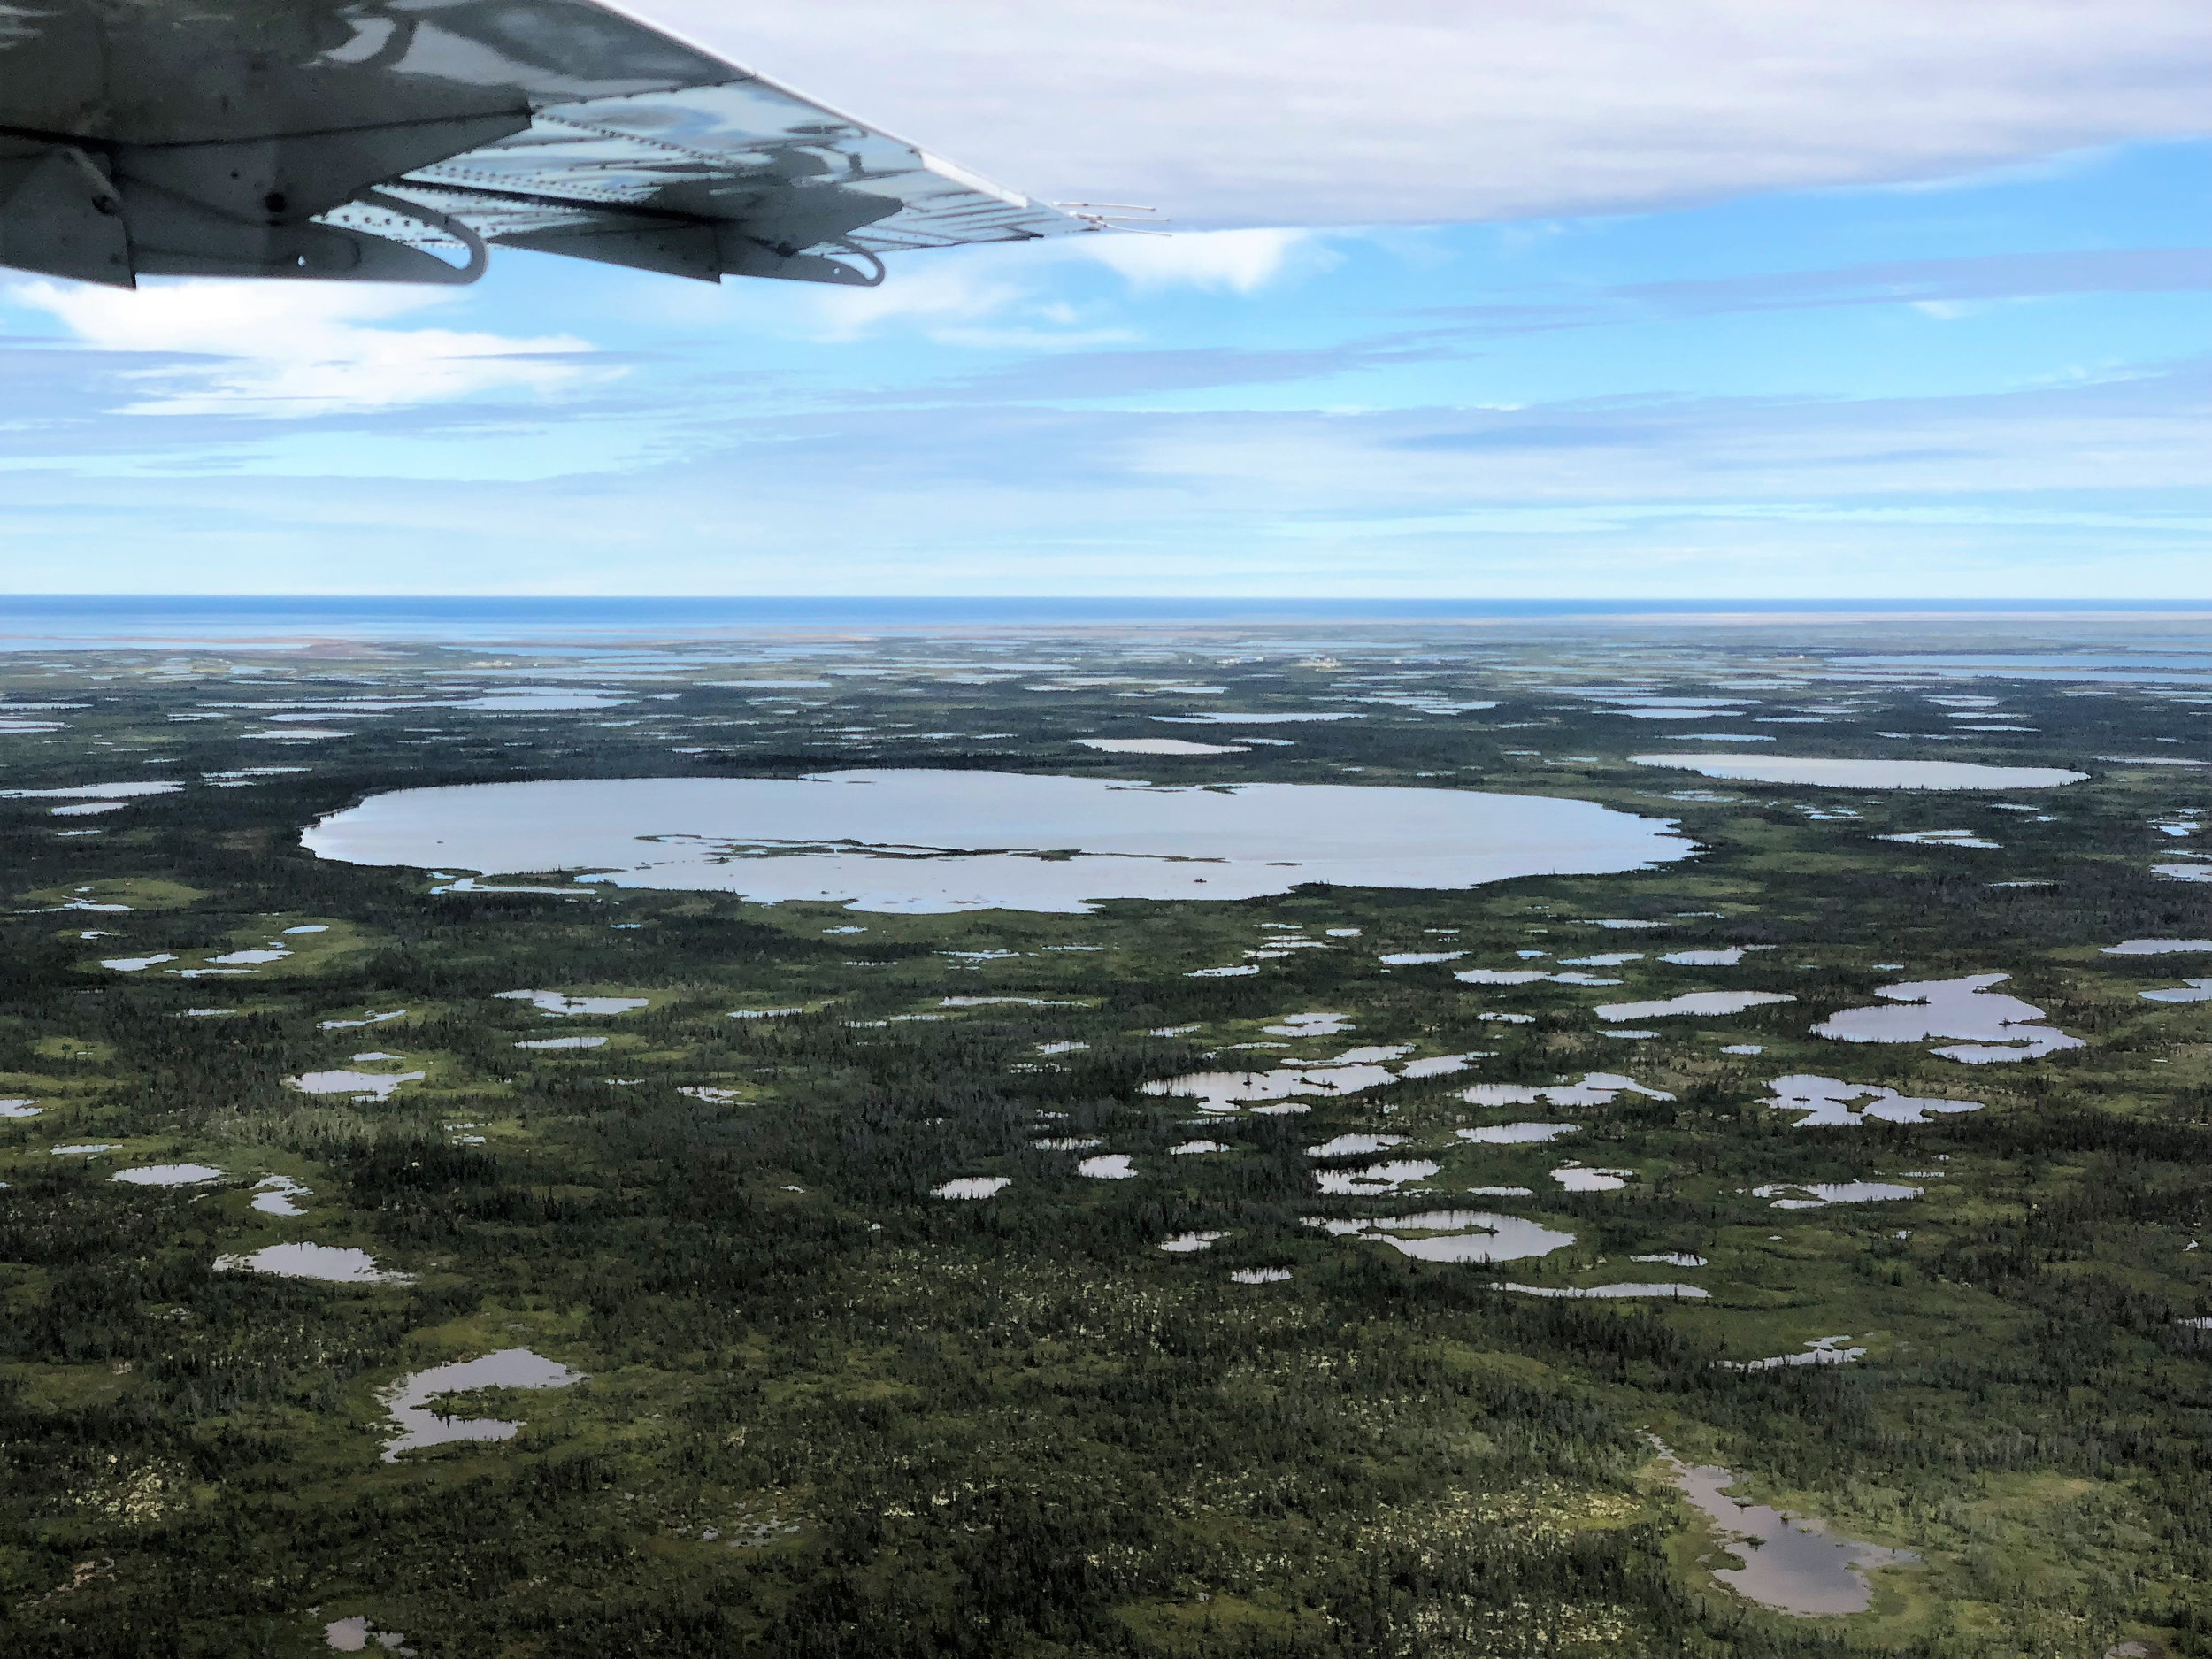 teri_arctic_snorkeling_whales_spiritedtable14.jpg